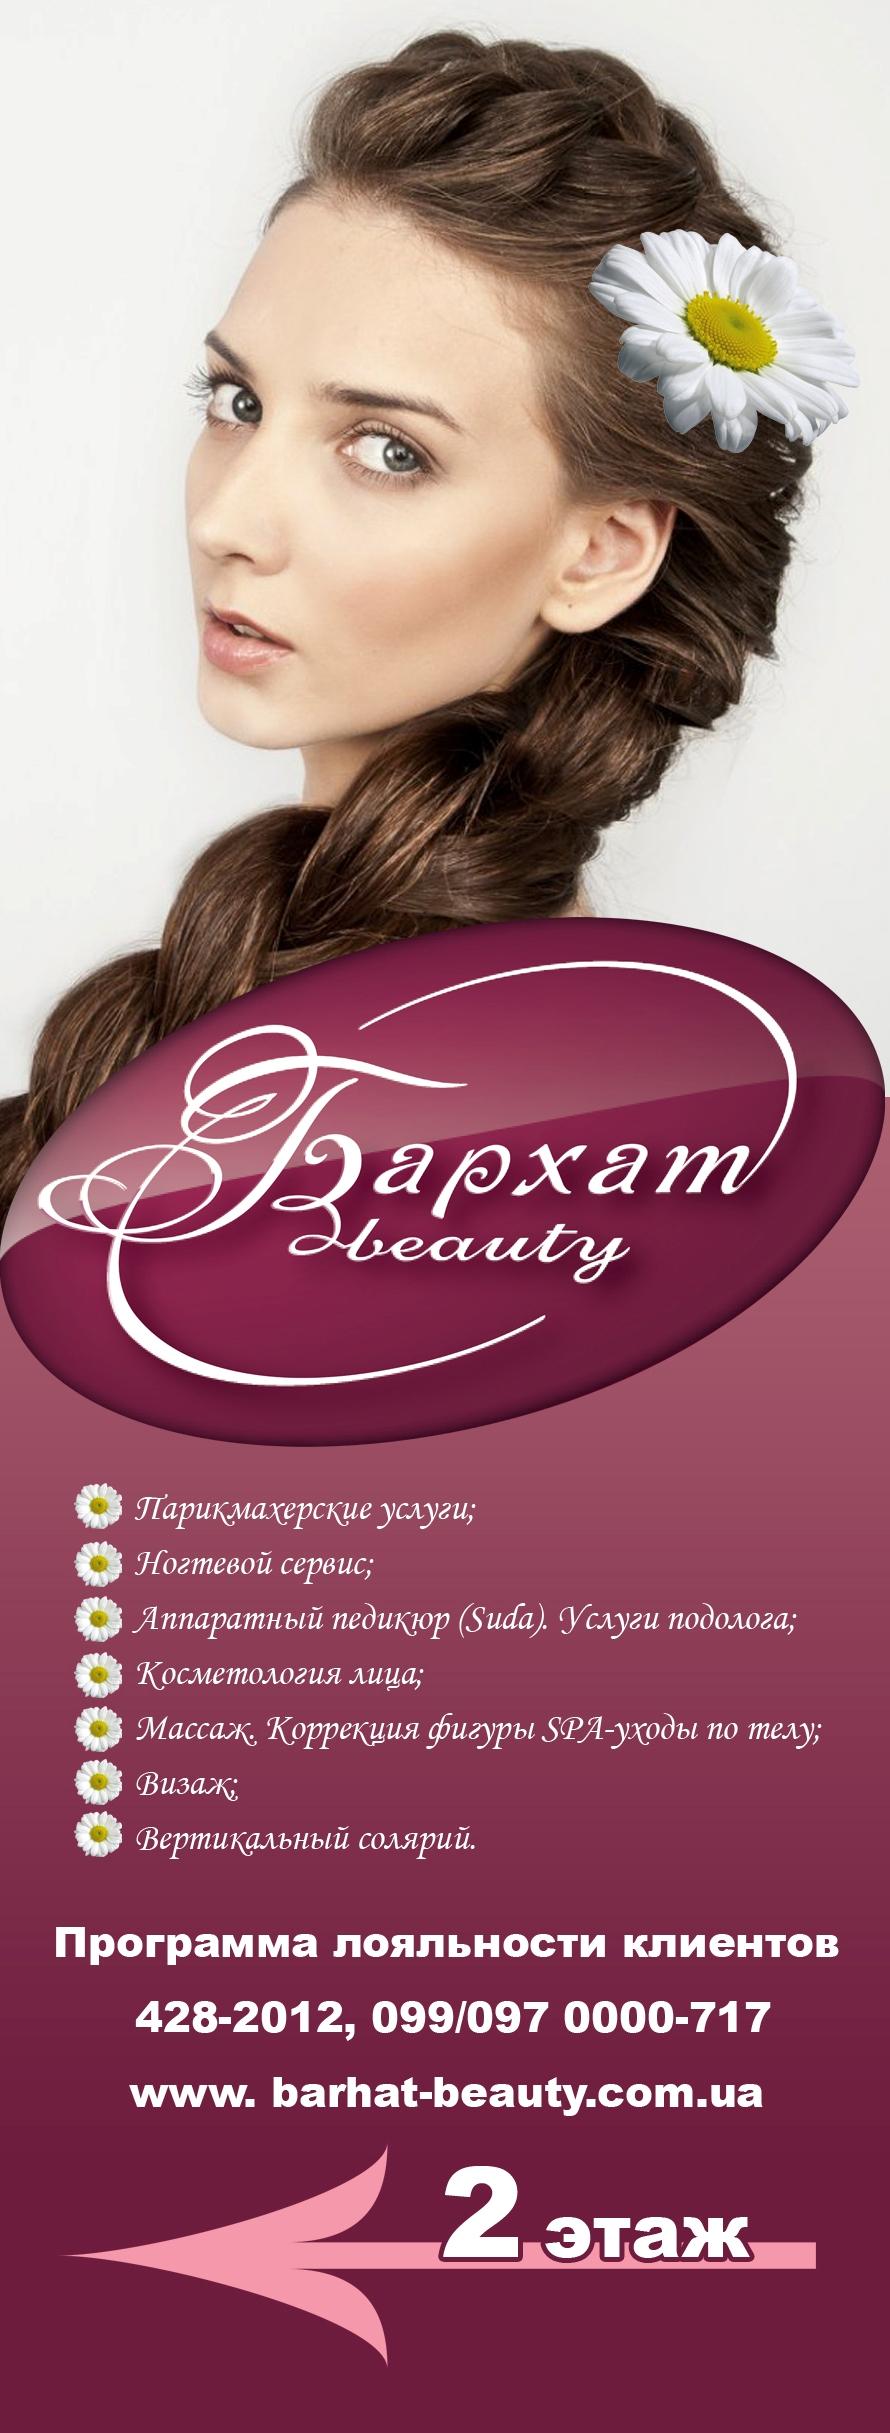 "Дизайн лайтбокса для Салона красоты ""Бархат-beauty"" (сюжет-5)"